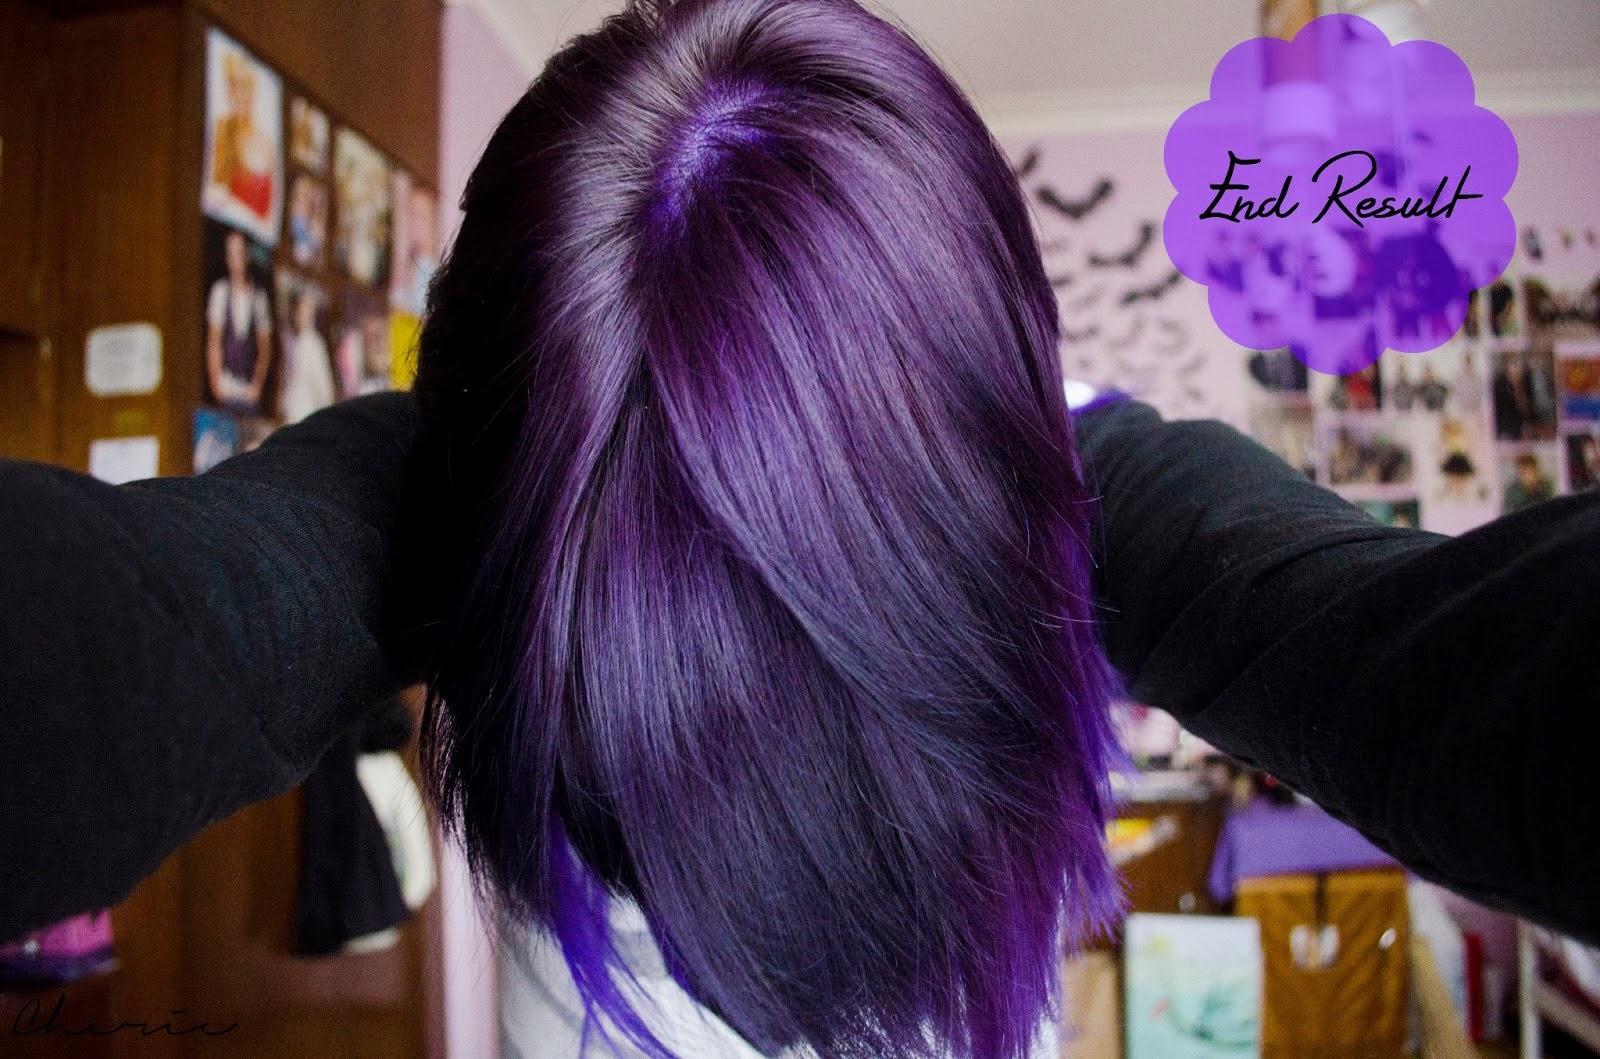 Purple Tinted Hair How to: maintain purple hair